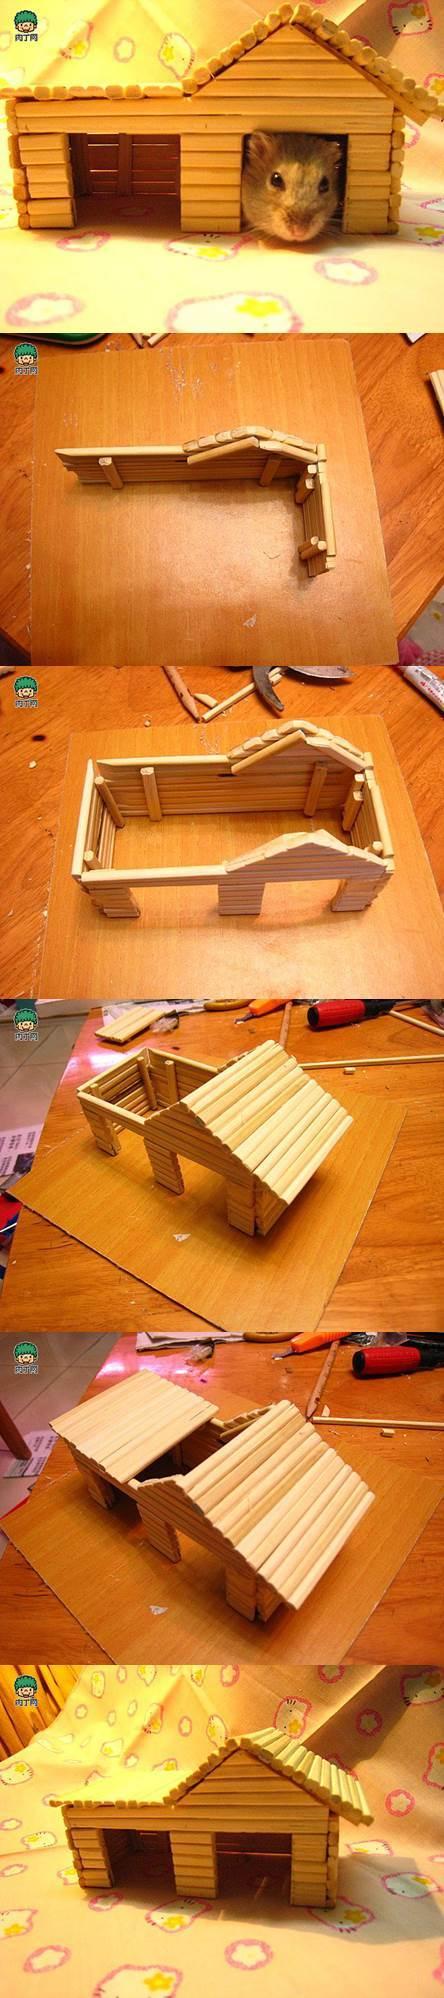 DIY Hamster House with Chopsticks